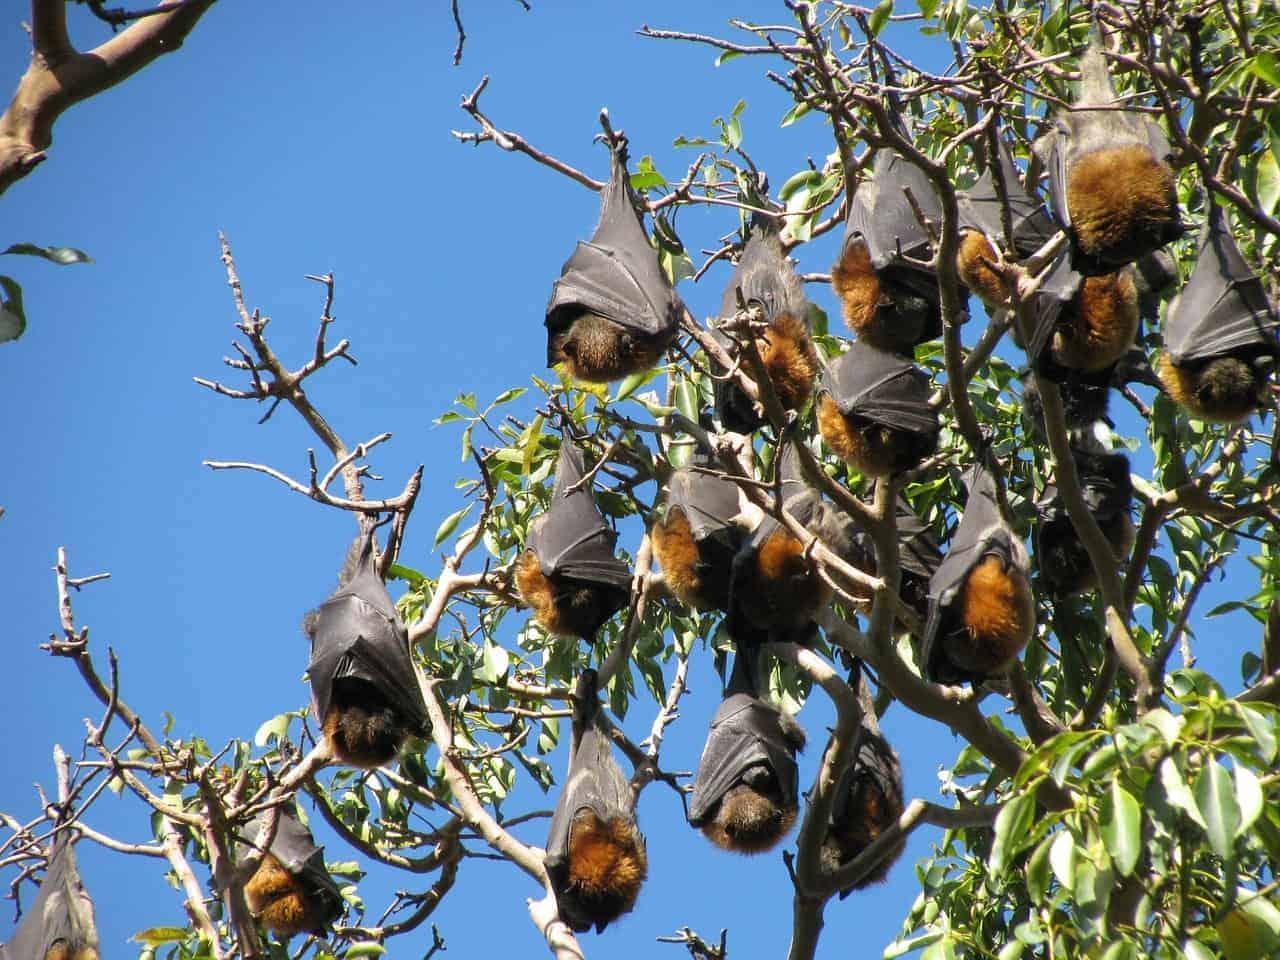 bats not flying